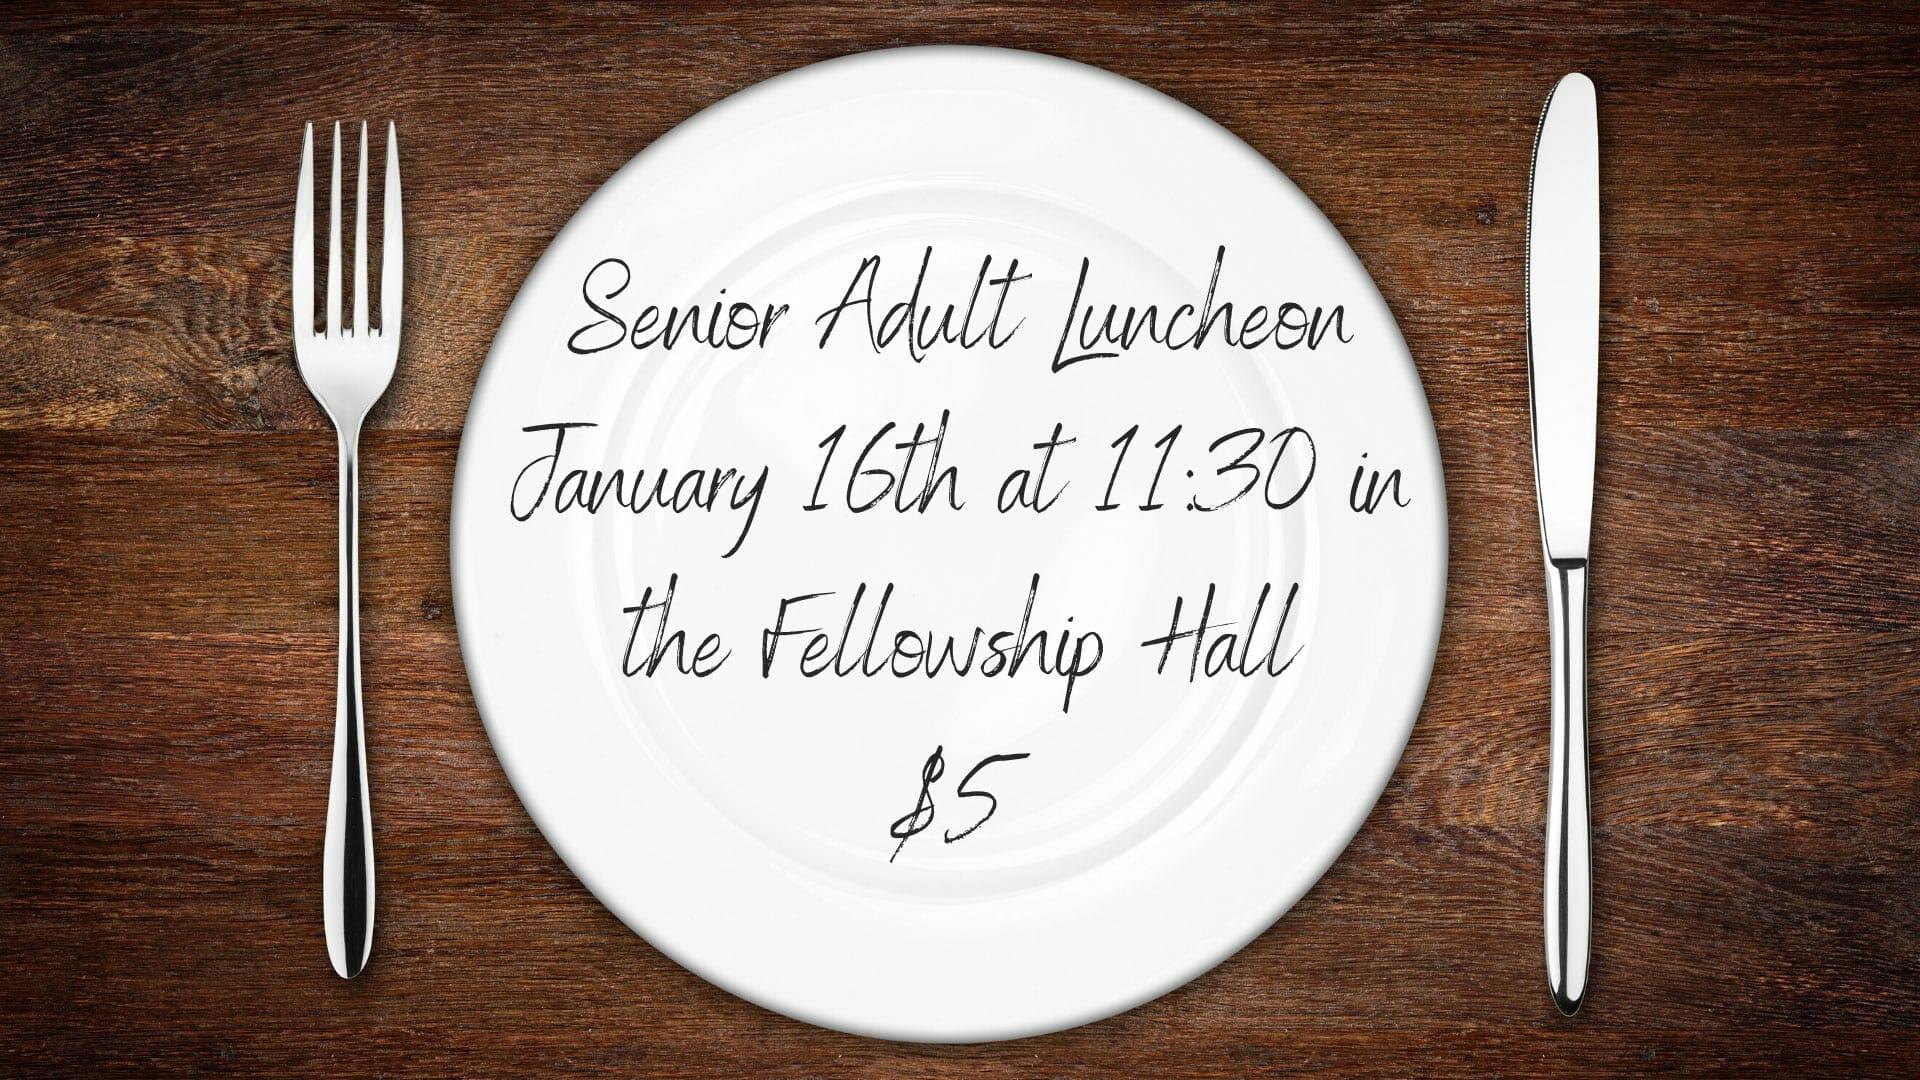 Senior Adult Luncheon